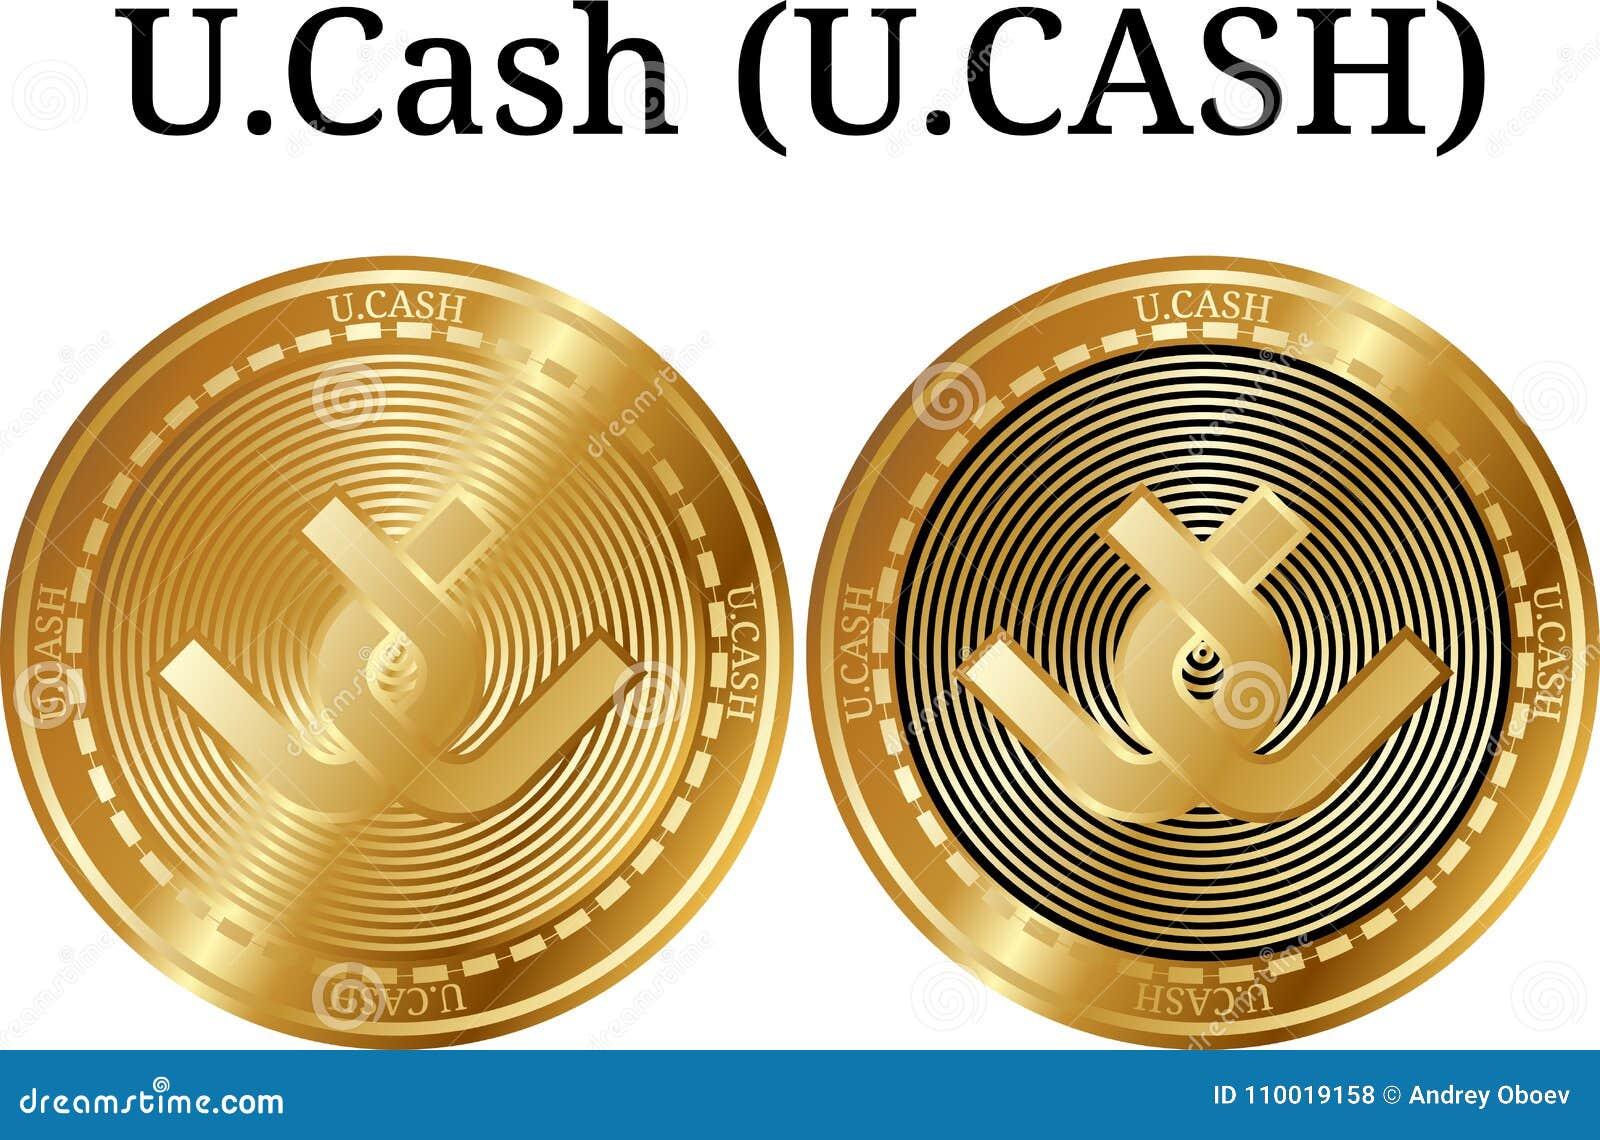 Set of physical golden coin U.Cash (U.CASH), digital cryptocurrency. U.Cash (U.CASH) icon set.